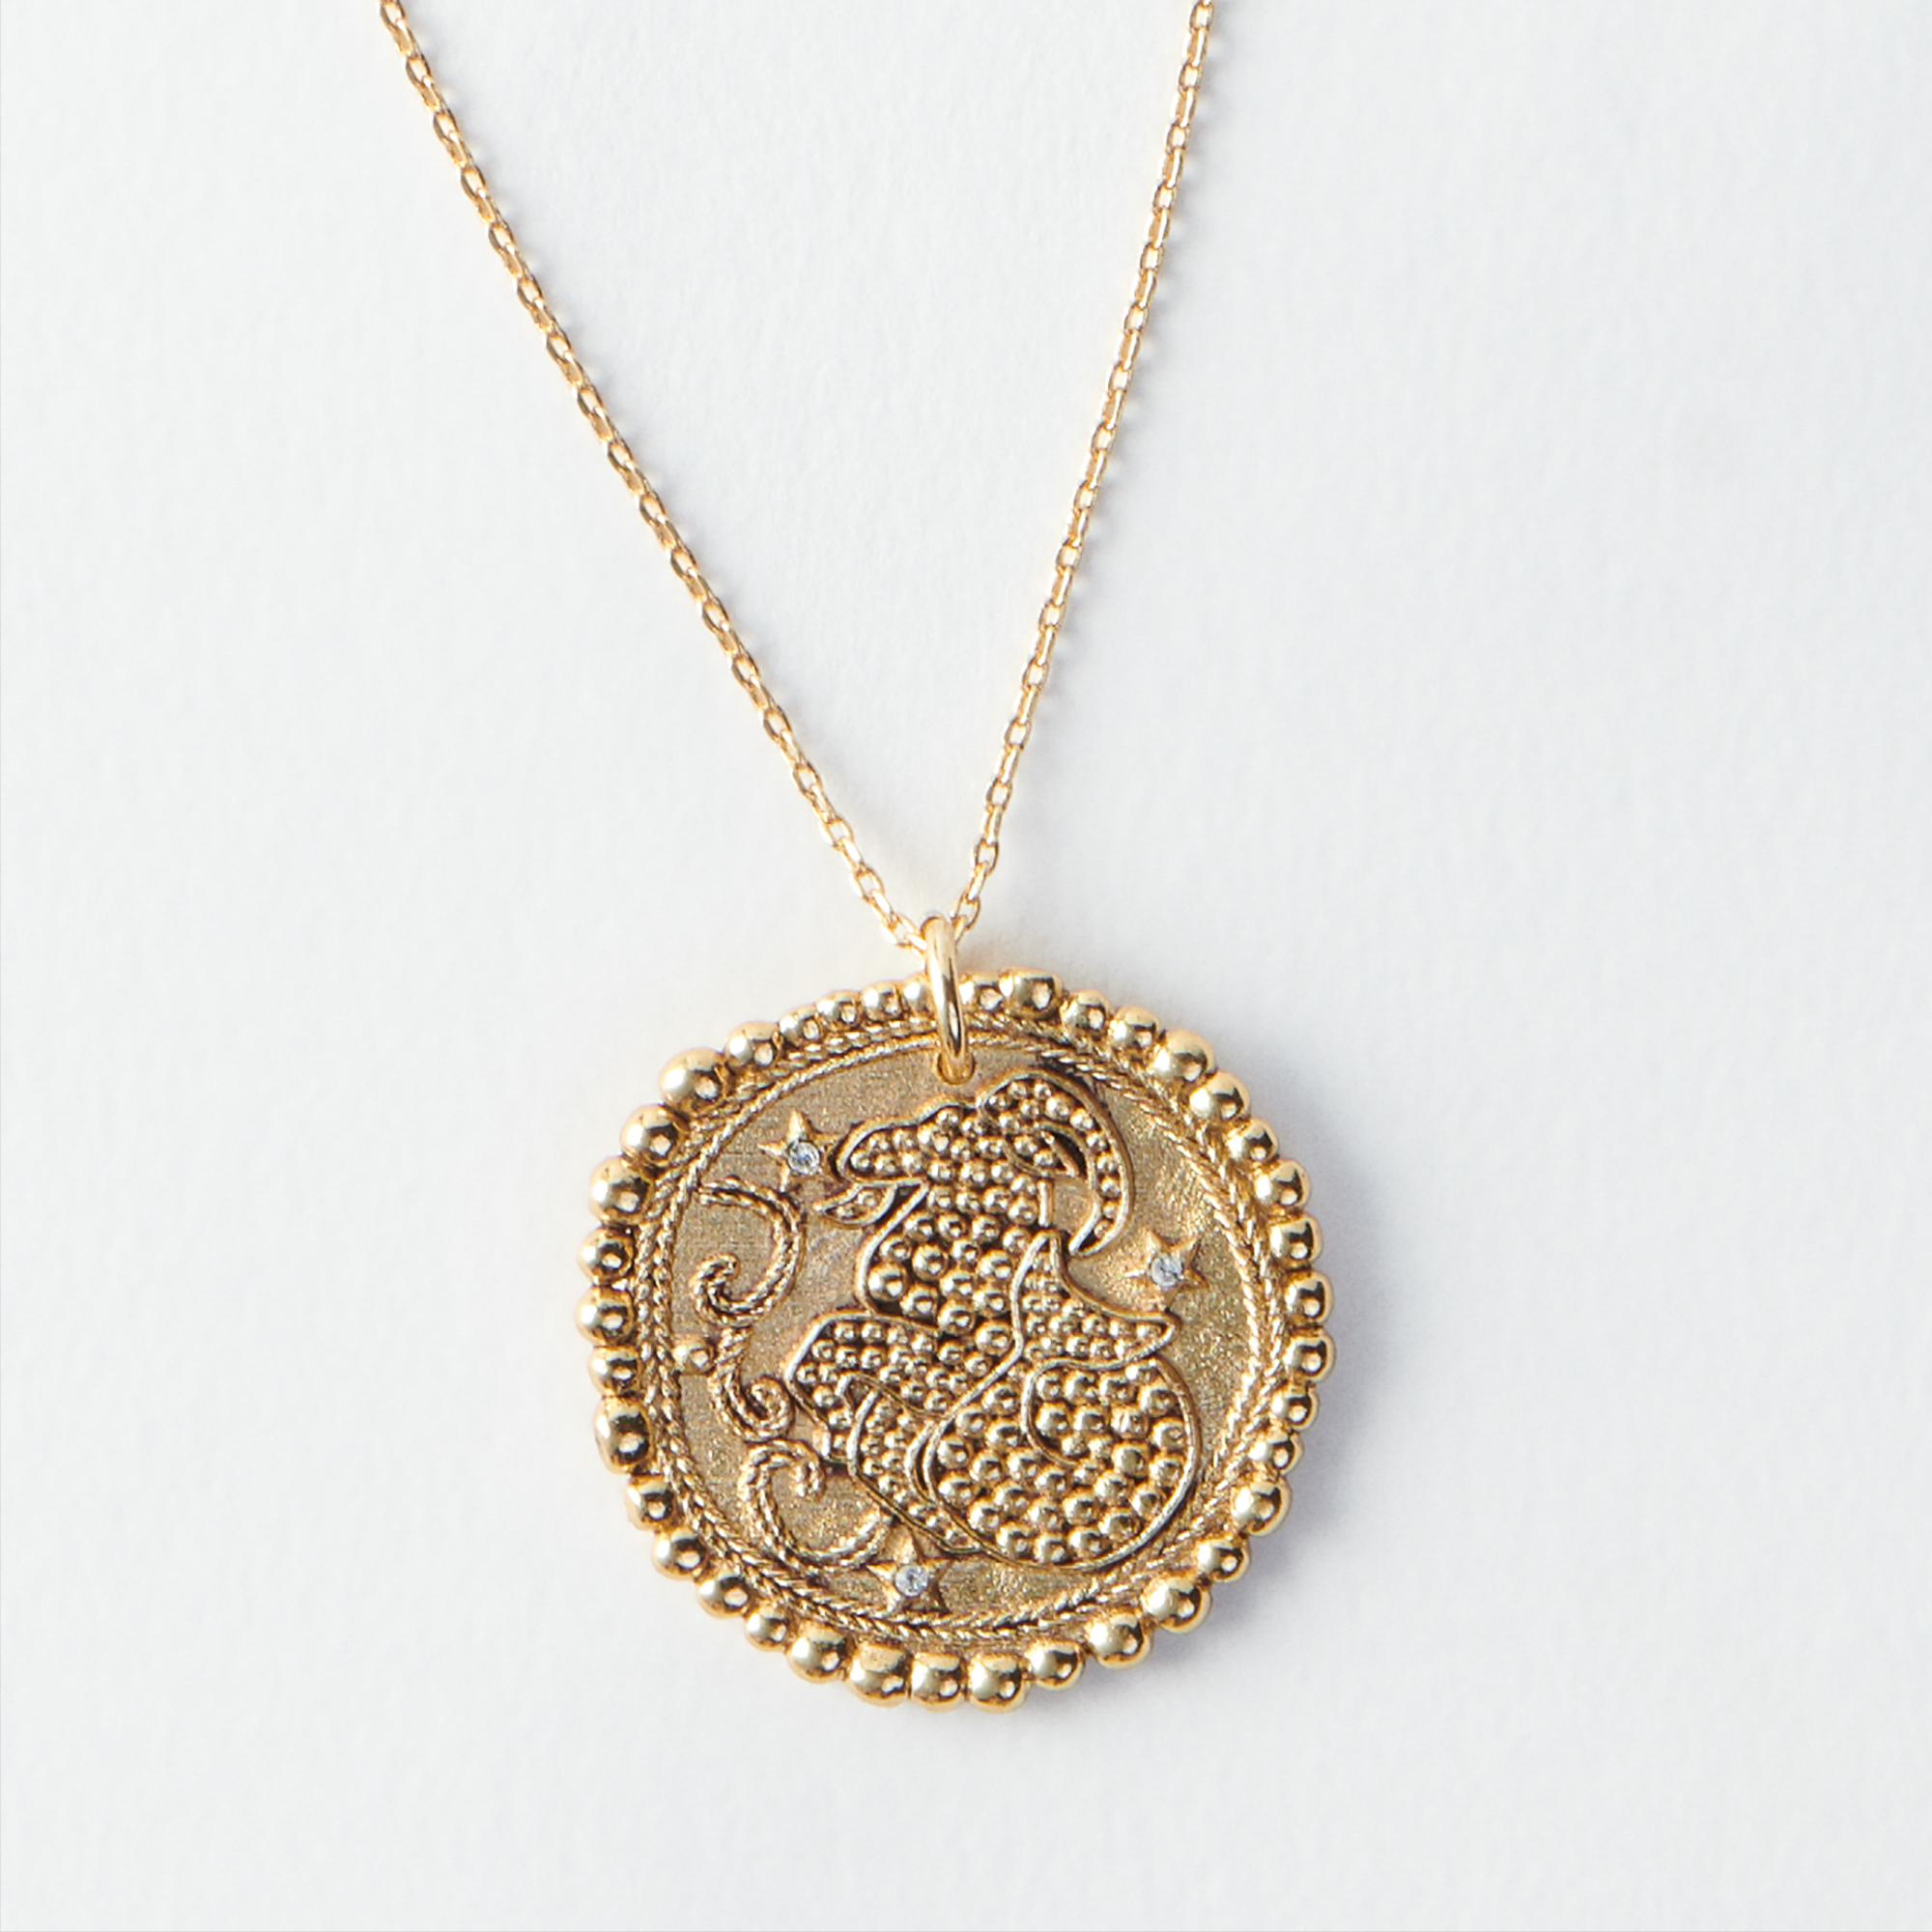 Capricorn Zodiac Necklace - Gold